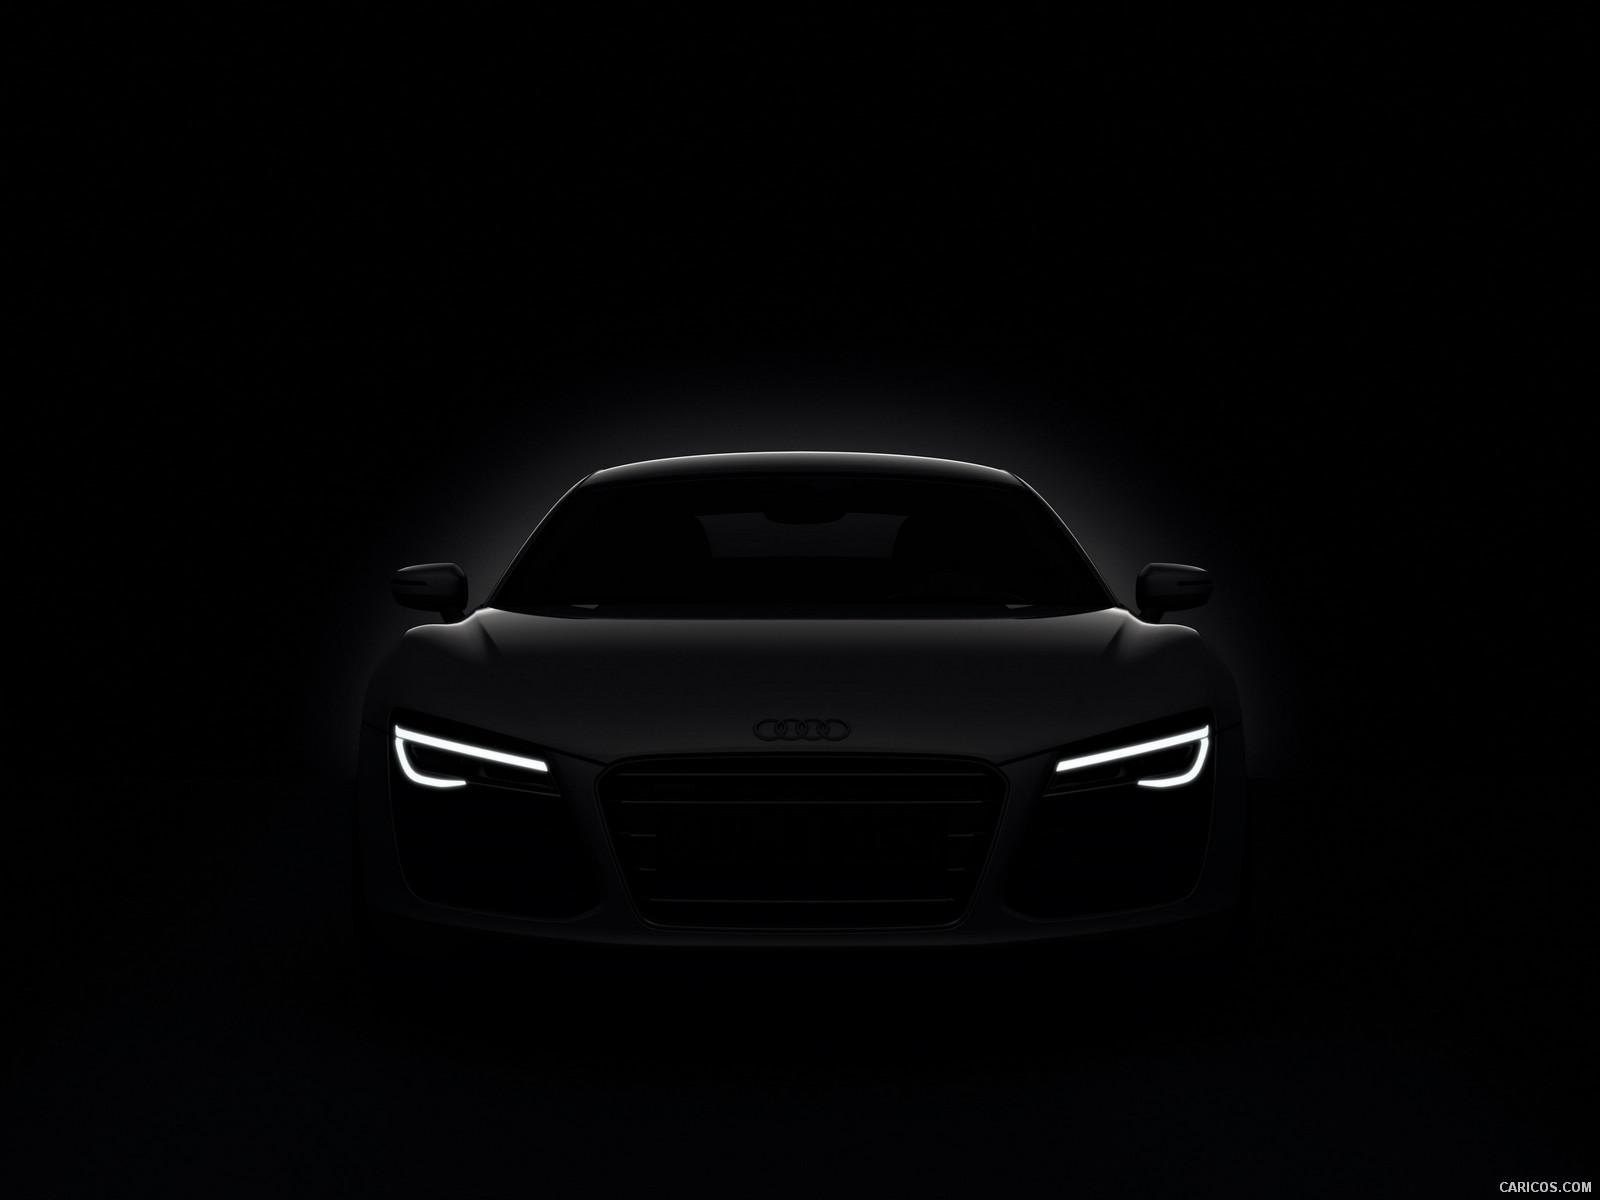 56 Audi Headlights Wallpaper On Wallpapersafari